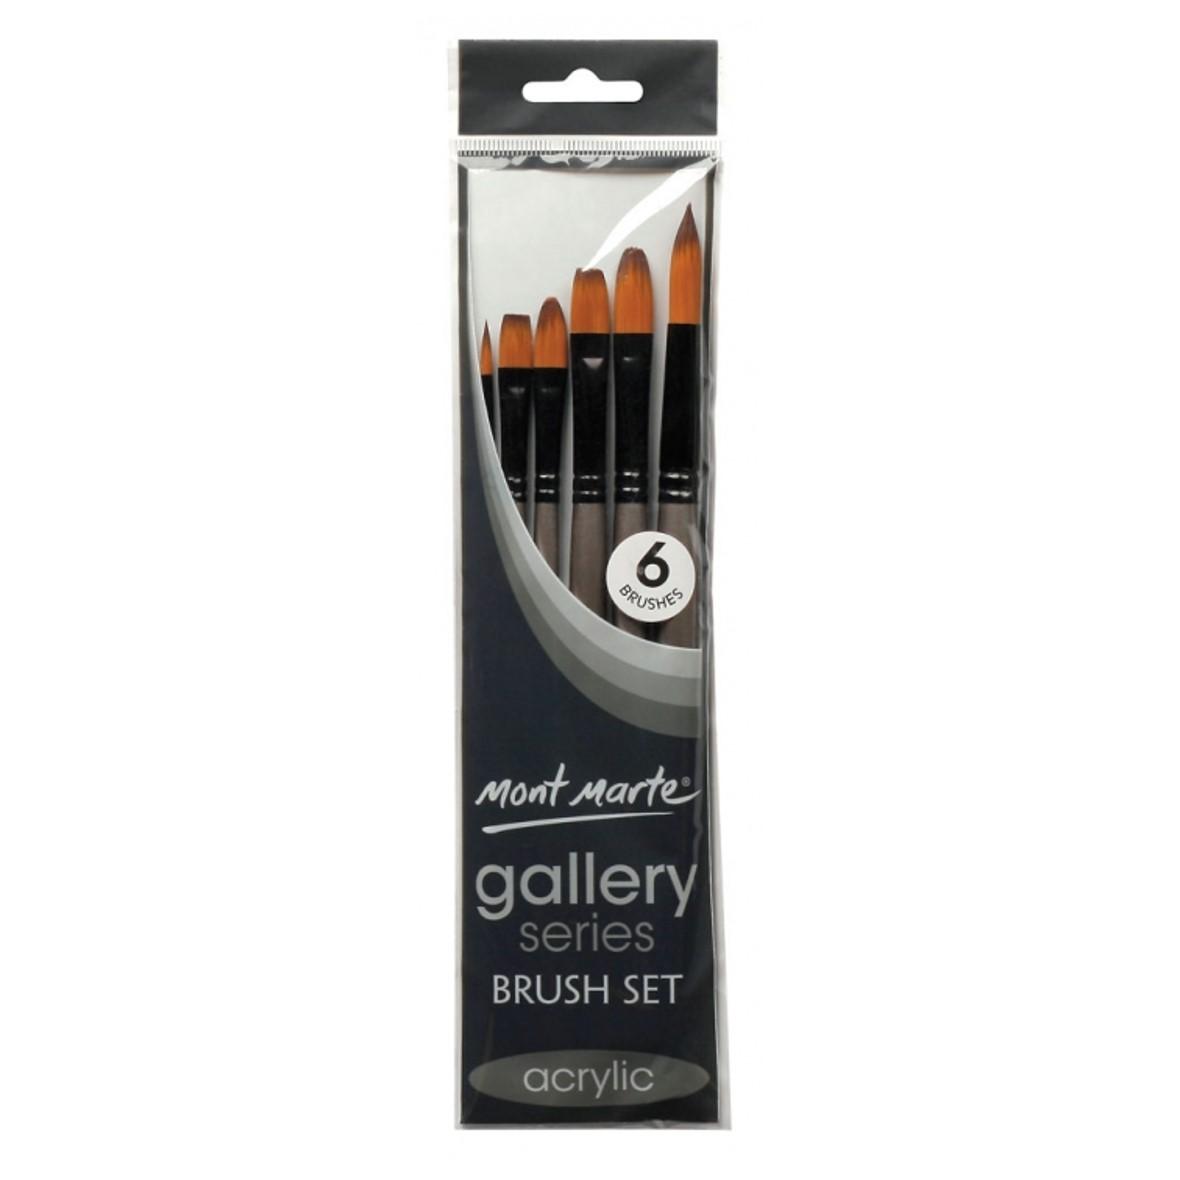 Gallery Series Brush Set Acrylic 6pce